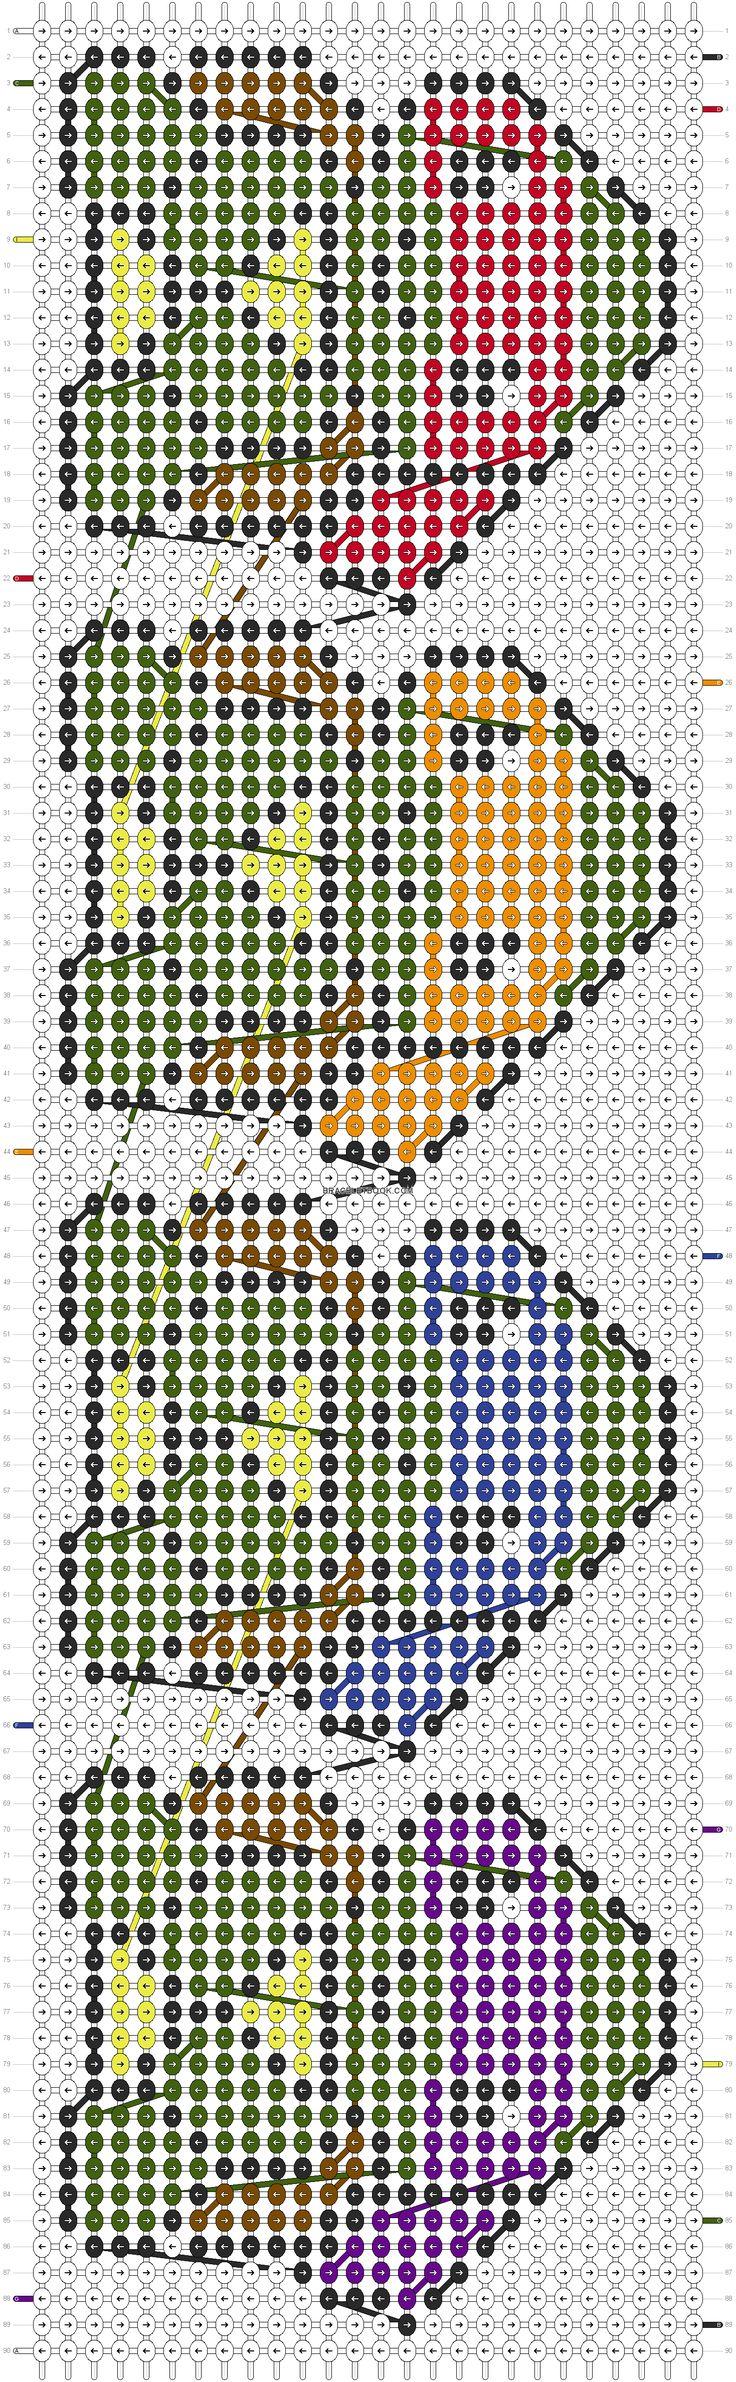 Фенечка схема черепашки